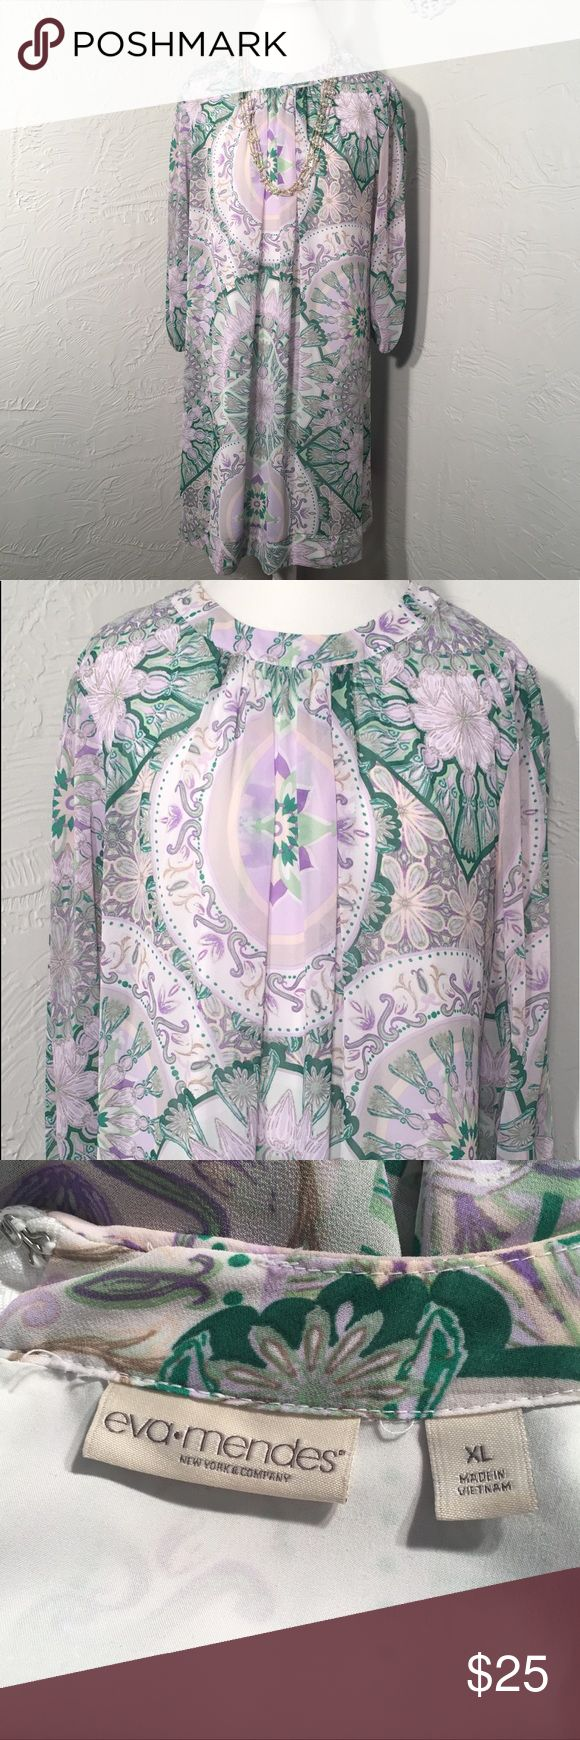 "Eva Mendes NY&Co floral print shift dress Eva Mendes floral print Sabrina shift dress.  Like new condition. 37"" long shoulder to hem. New York & Company Dresses Midi"